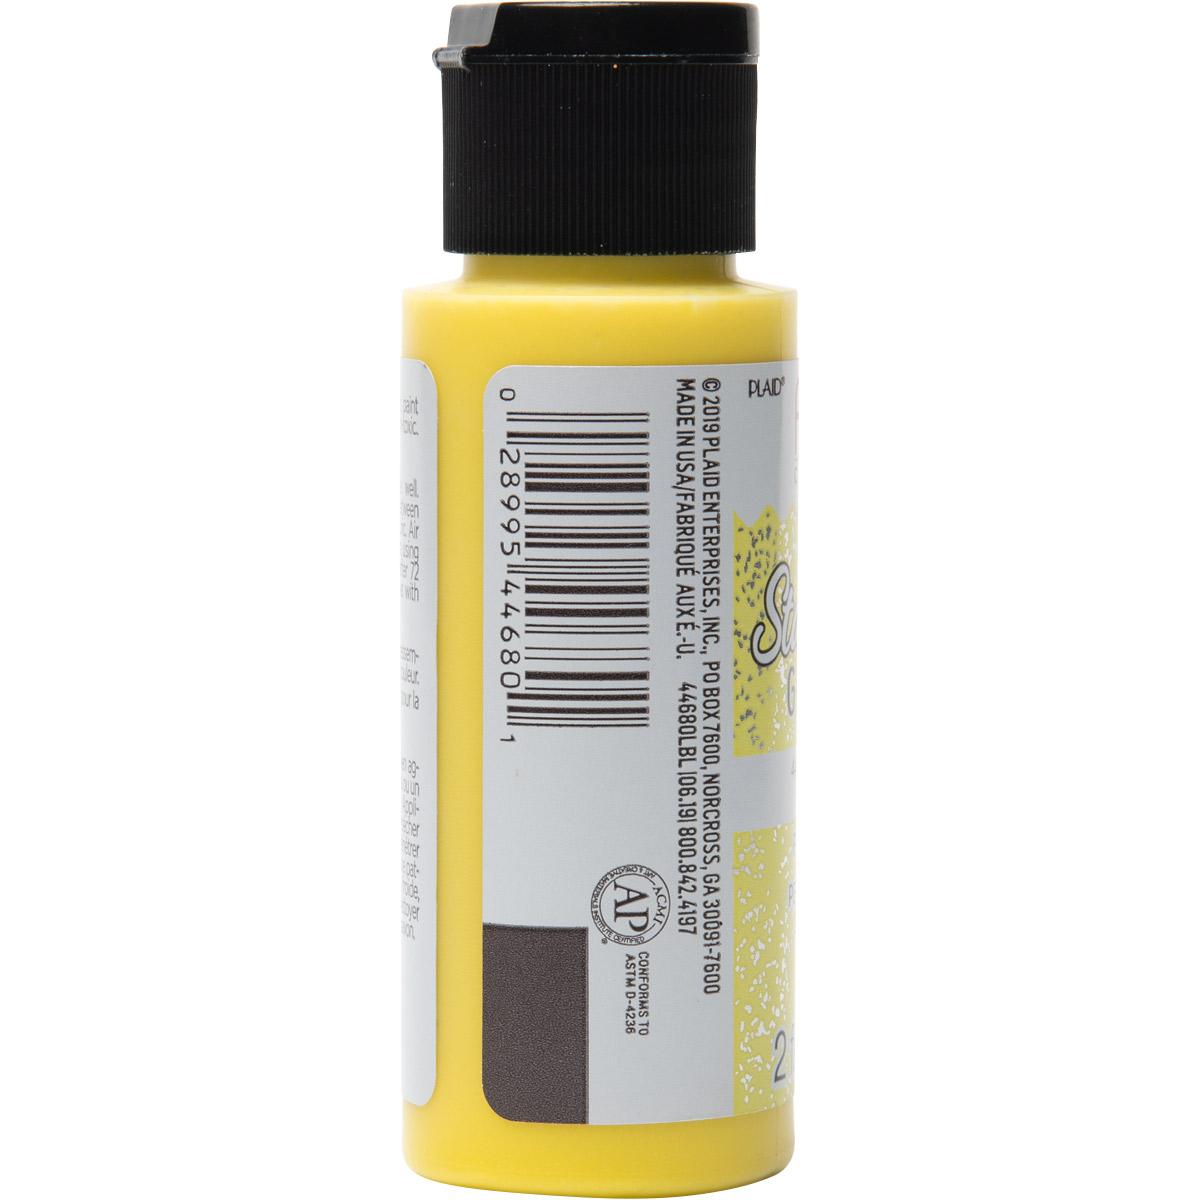 Fabric Creations™ StarStruck Glitter™ Fabric Paint - Lemon Ice, 2 oz.